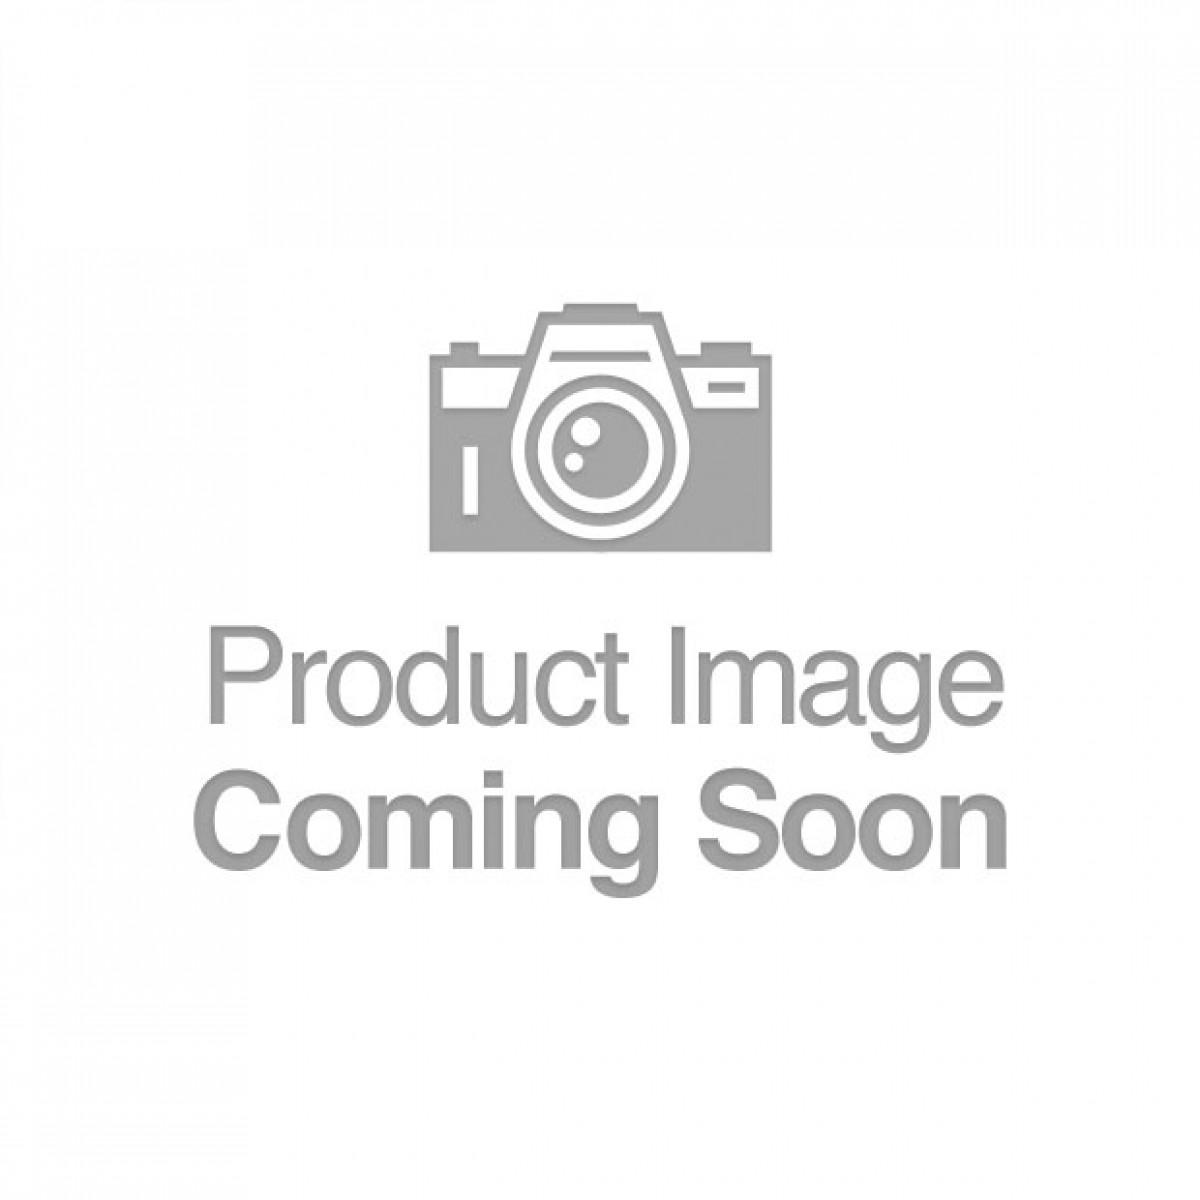 Lifestyles Ultra Sensitive Platinum - Pack of 3